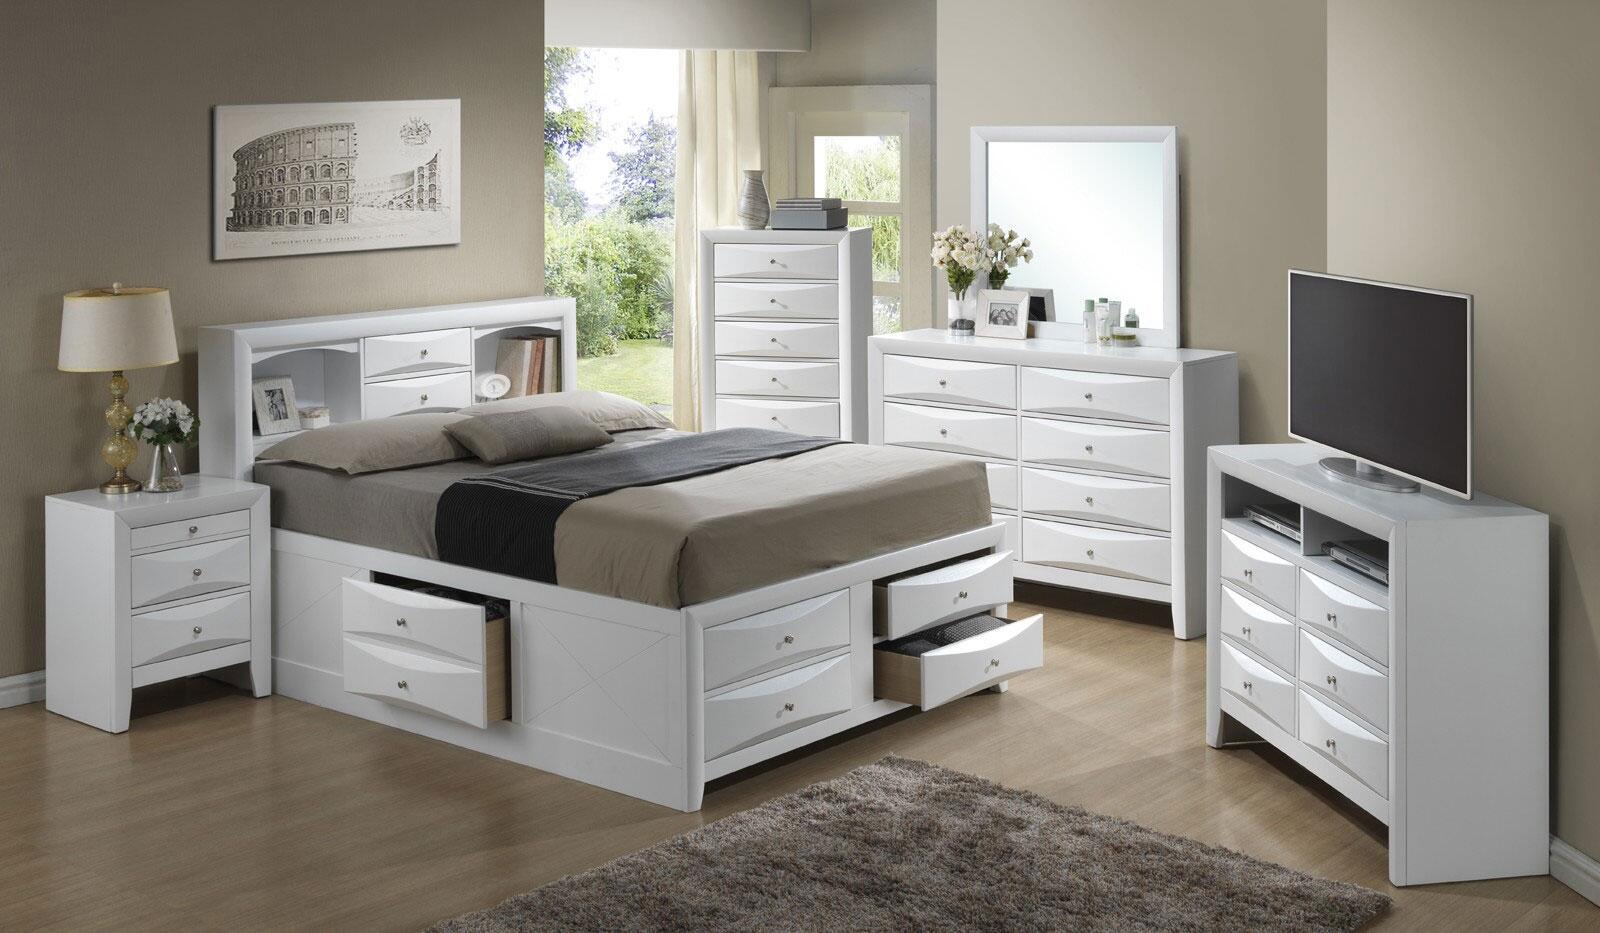 Glory Furniture Marilla 6 Piece Full Size Bedroom Set